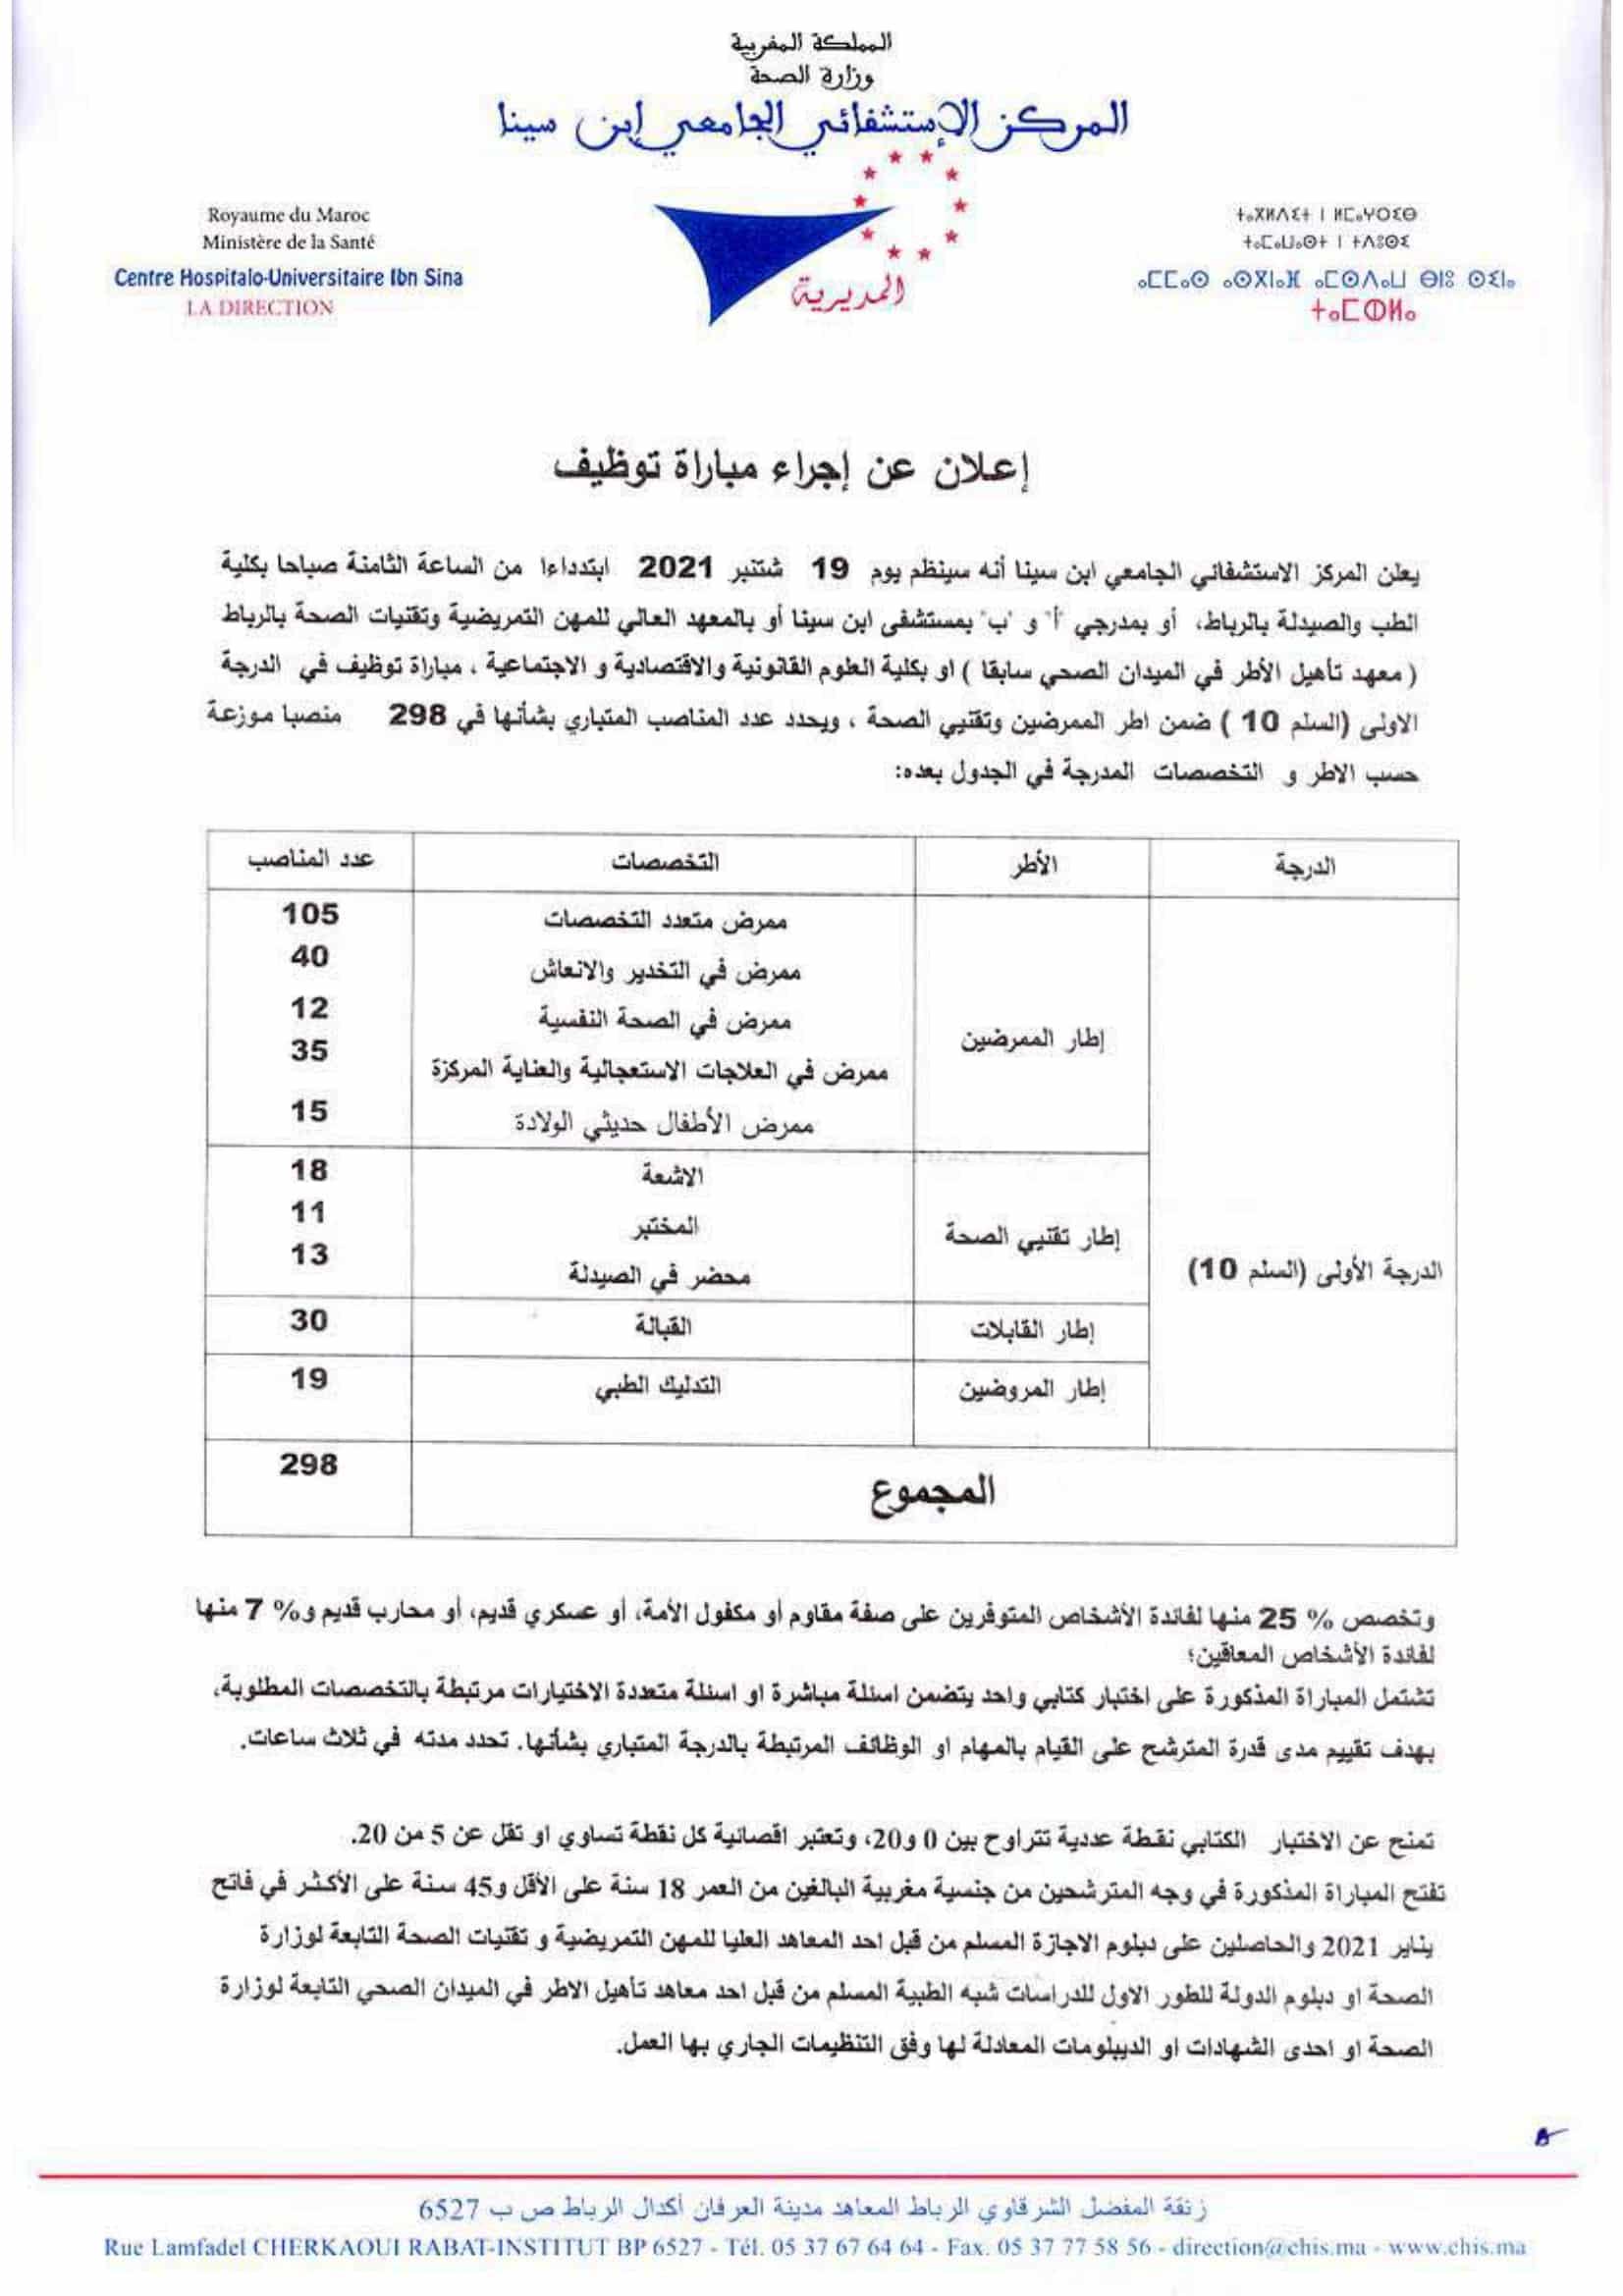 decisionavisrecrutementinfiettechsante 4 Concours CHU Ibn Sina 2021 (298 Postes)